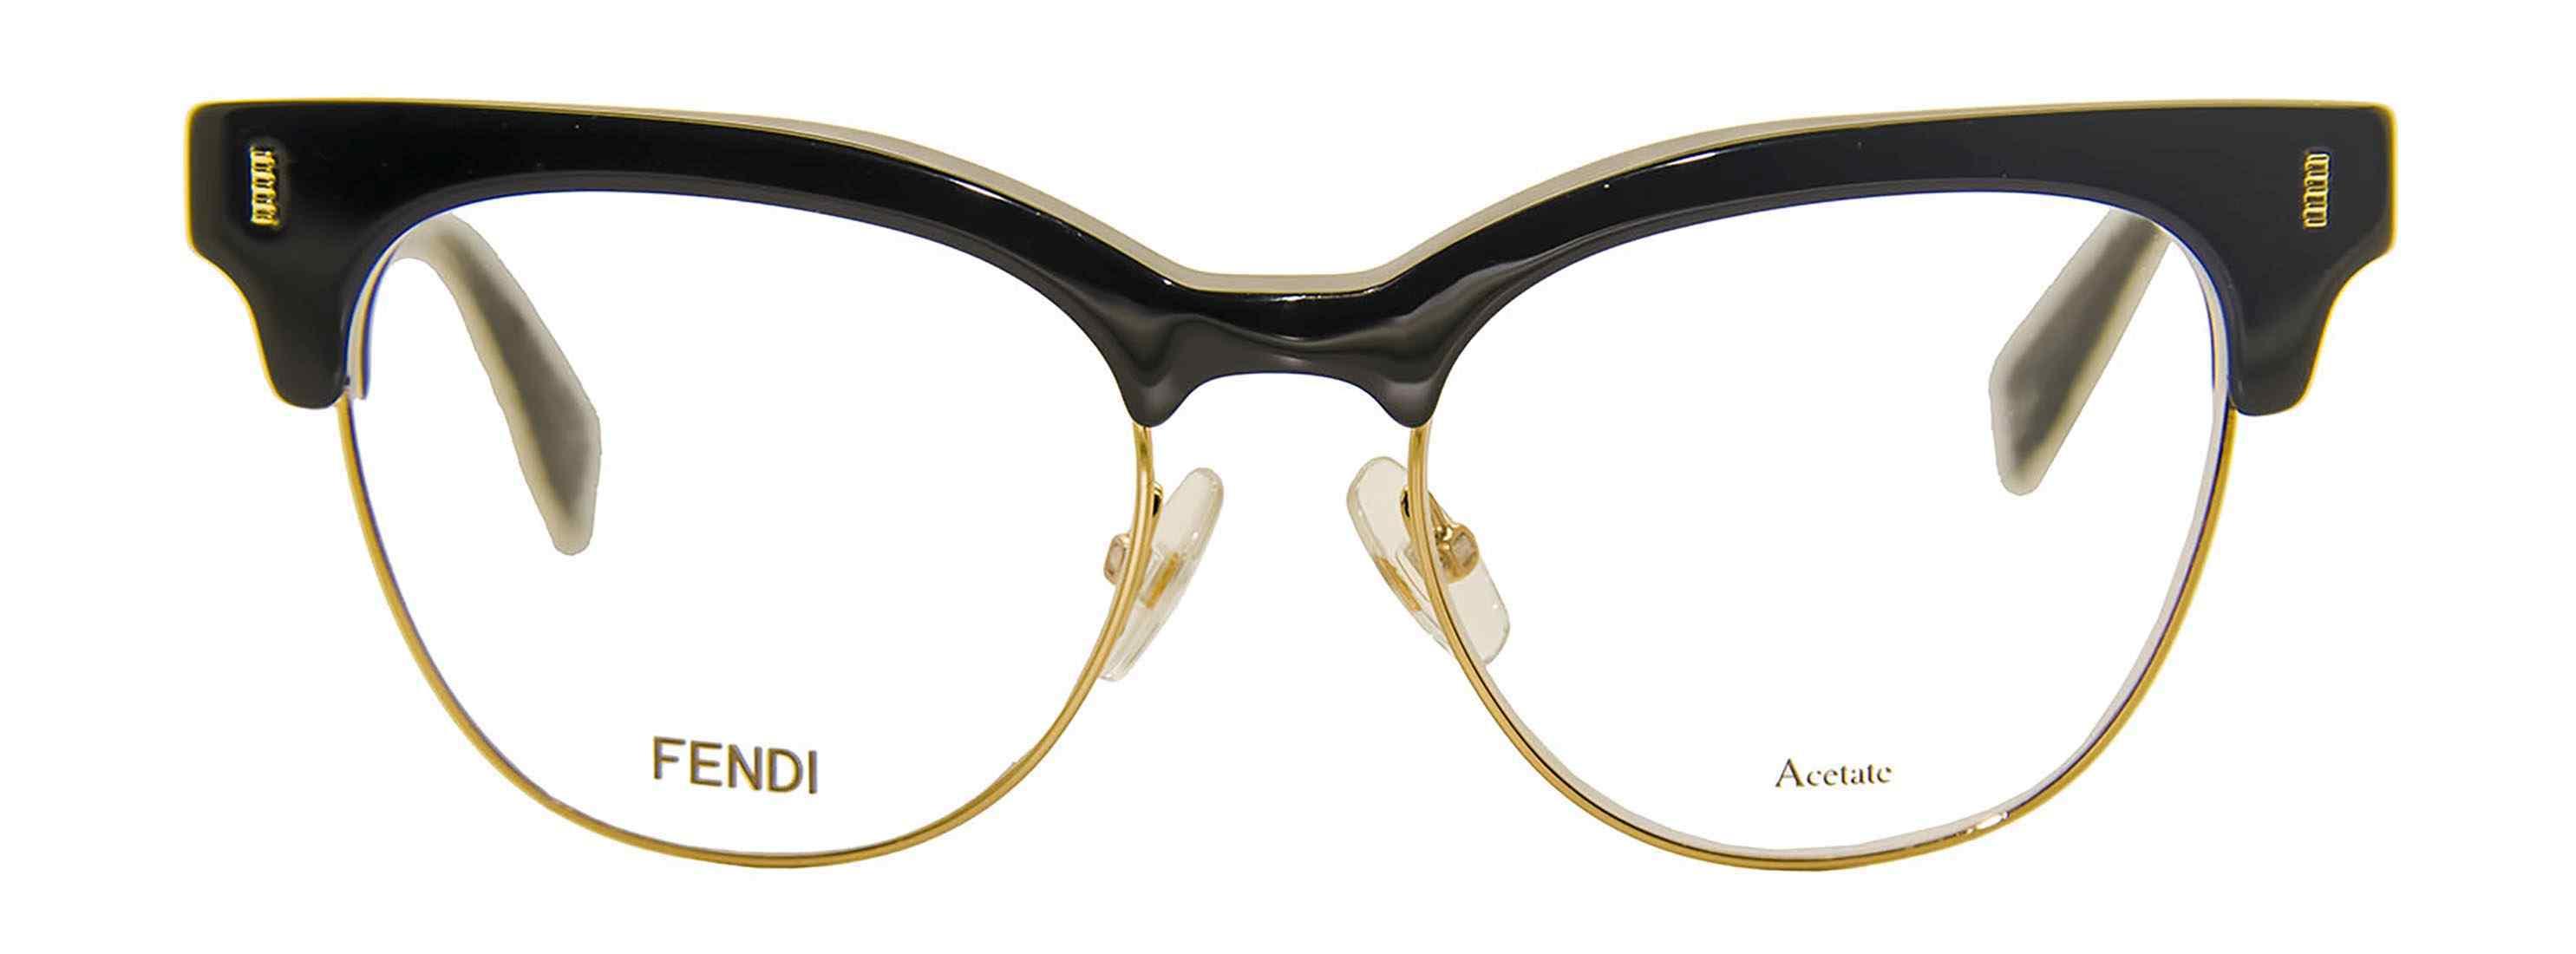 Fendi spectacles 0163 Vjg 01 2 2970x1100